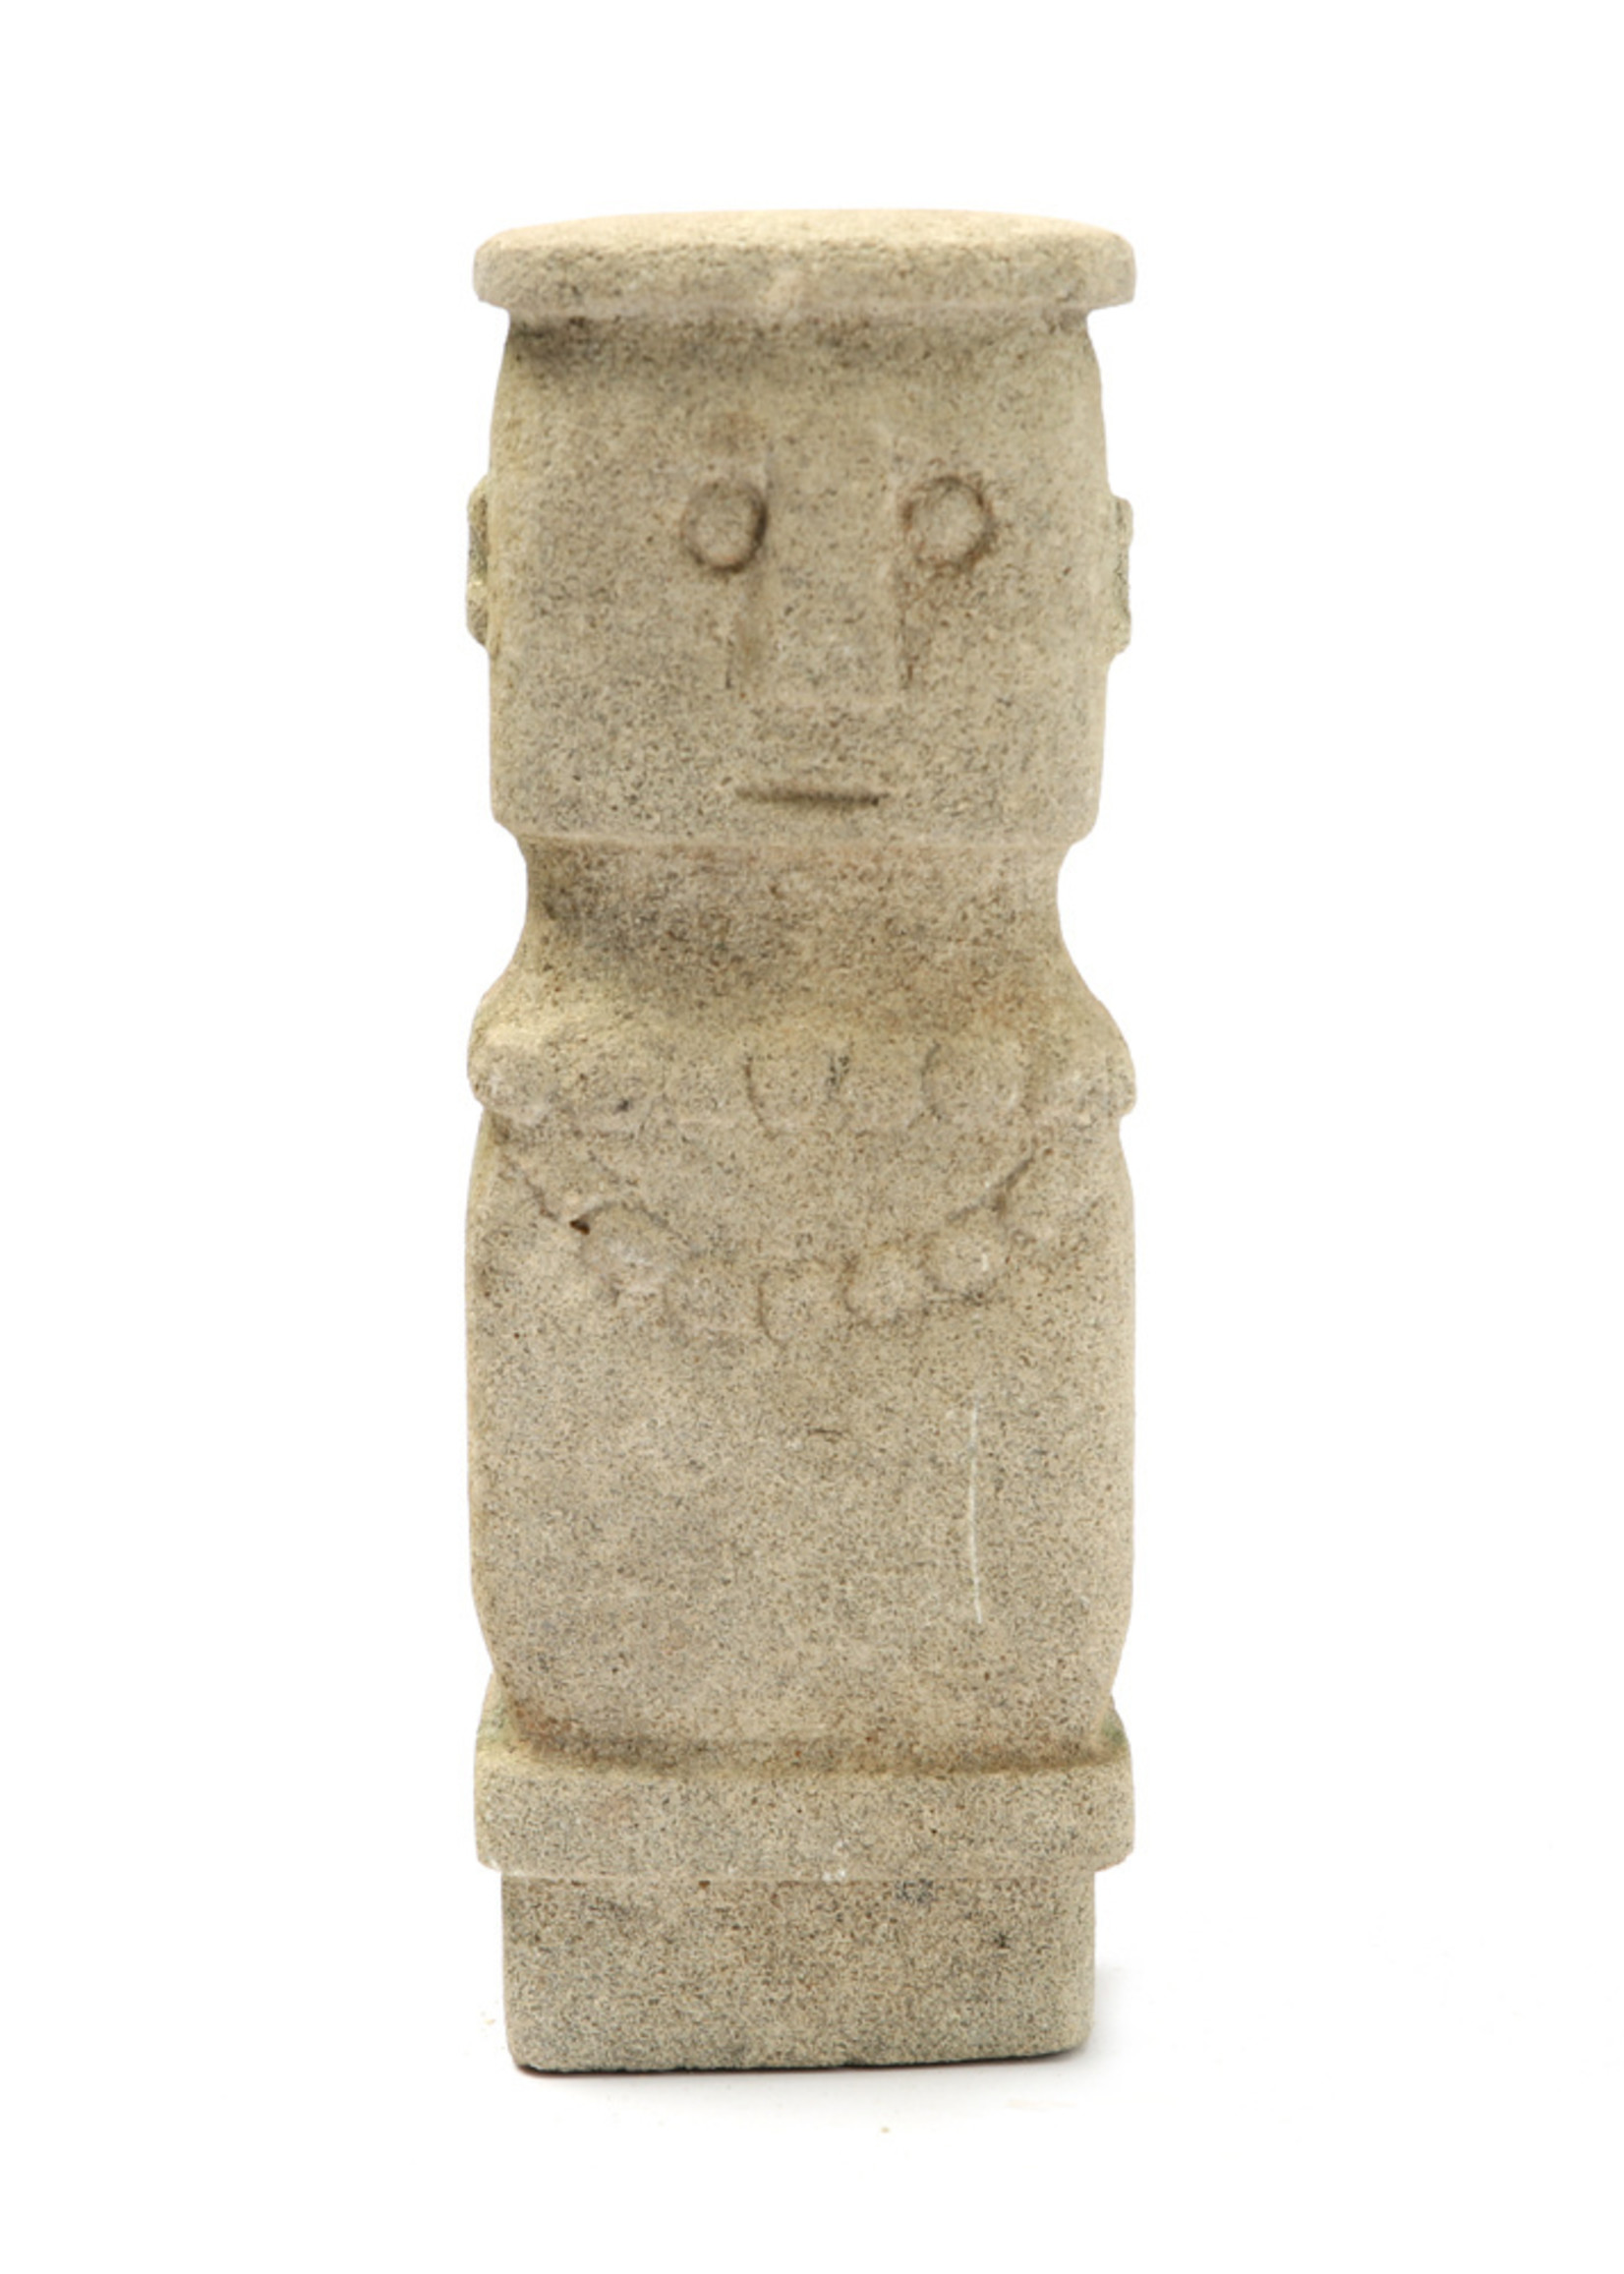 Sumba Stone Statue #05 - Natural